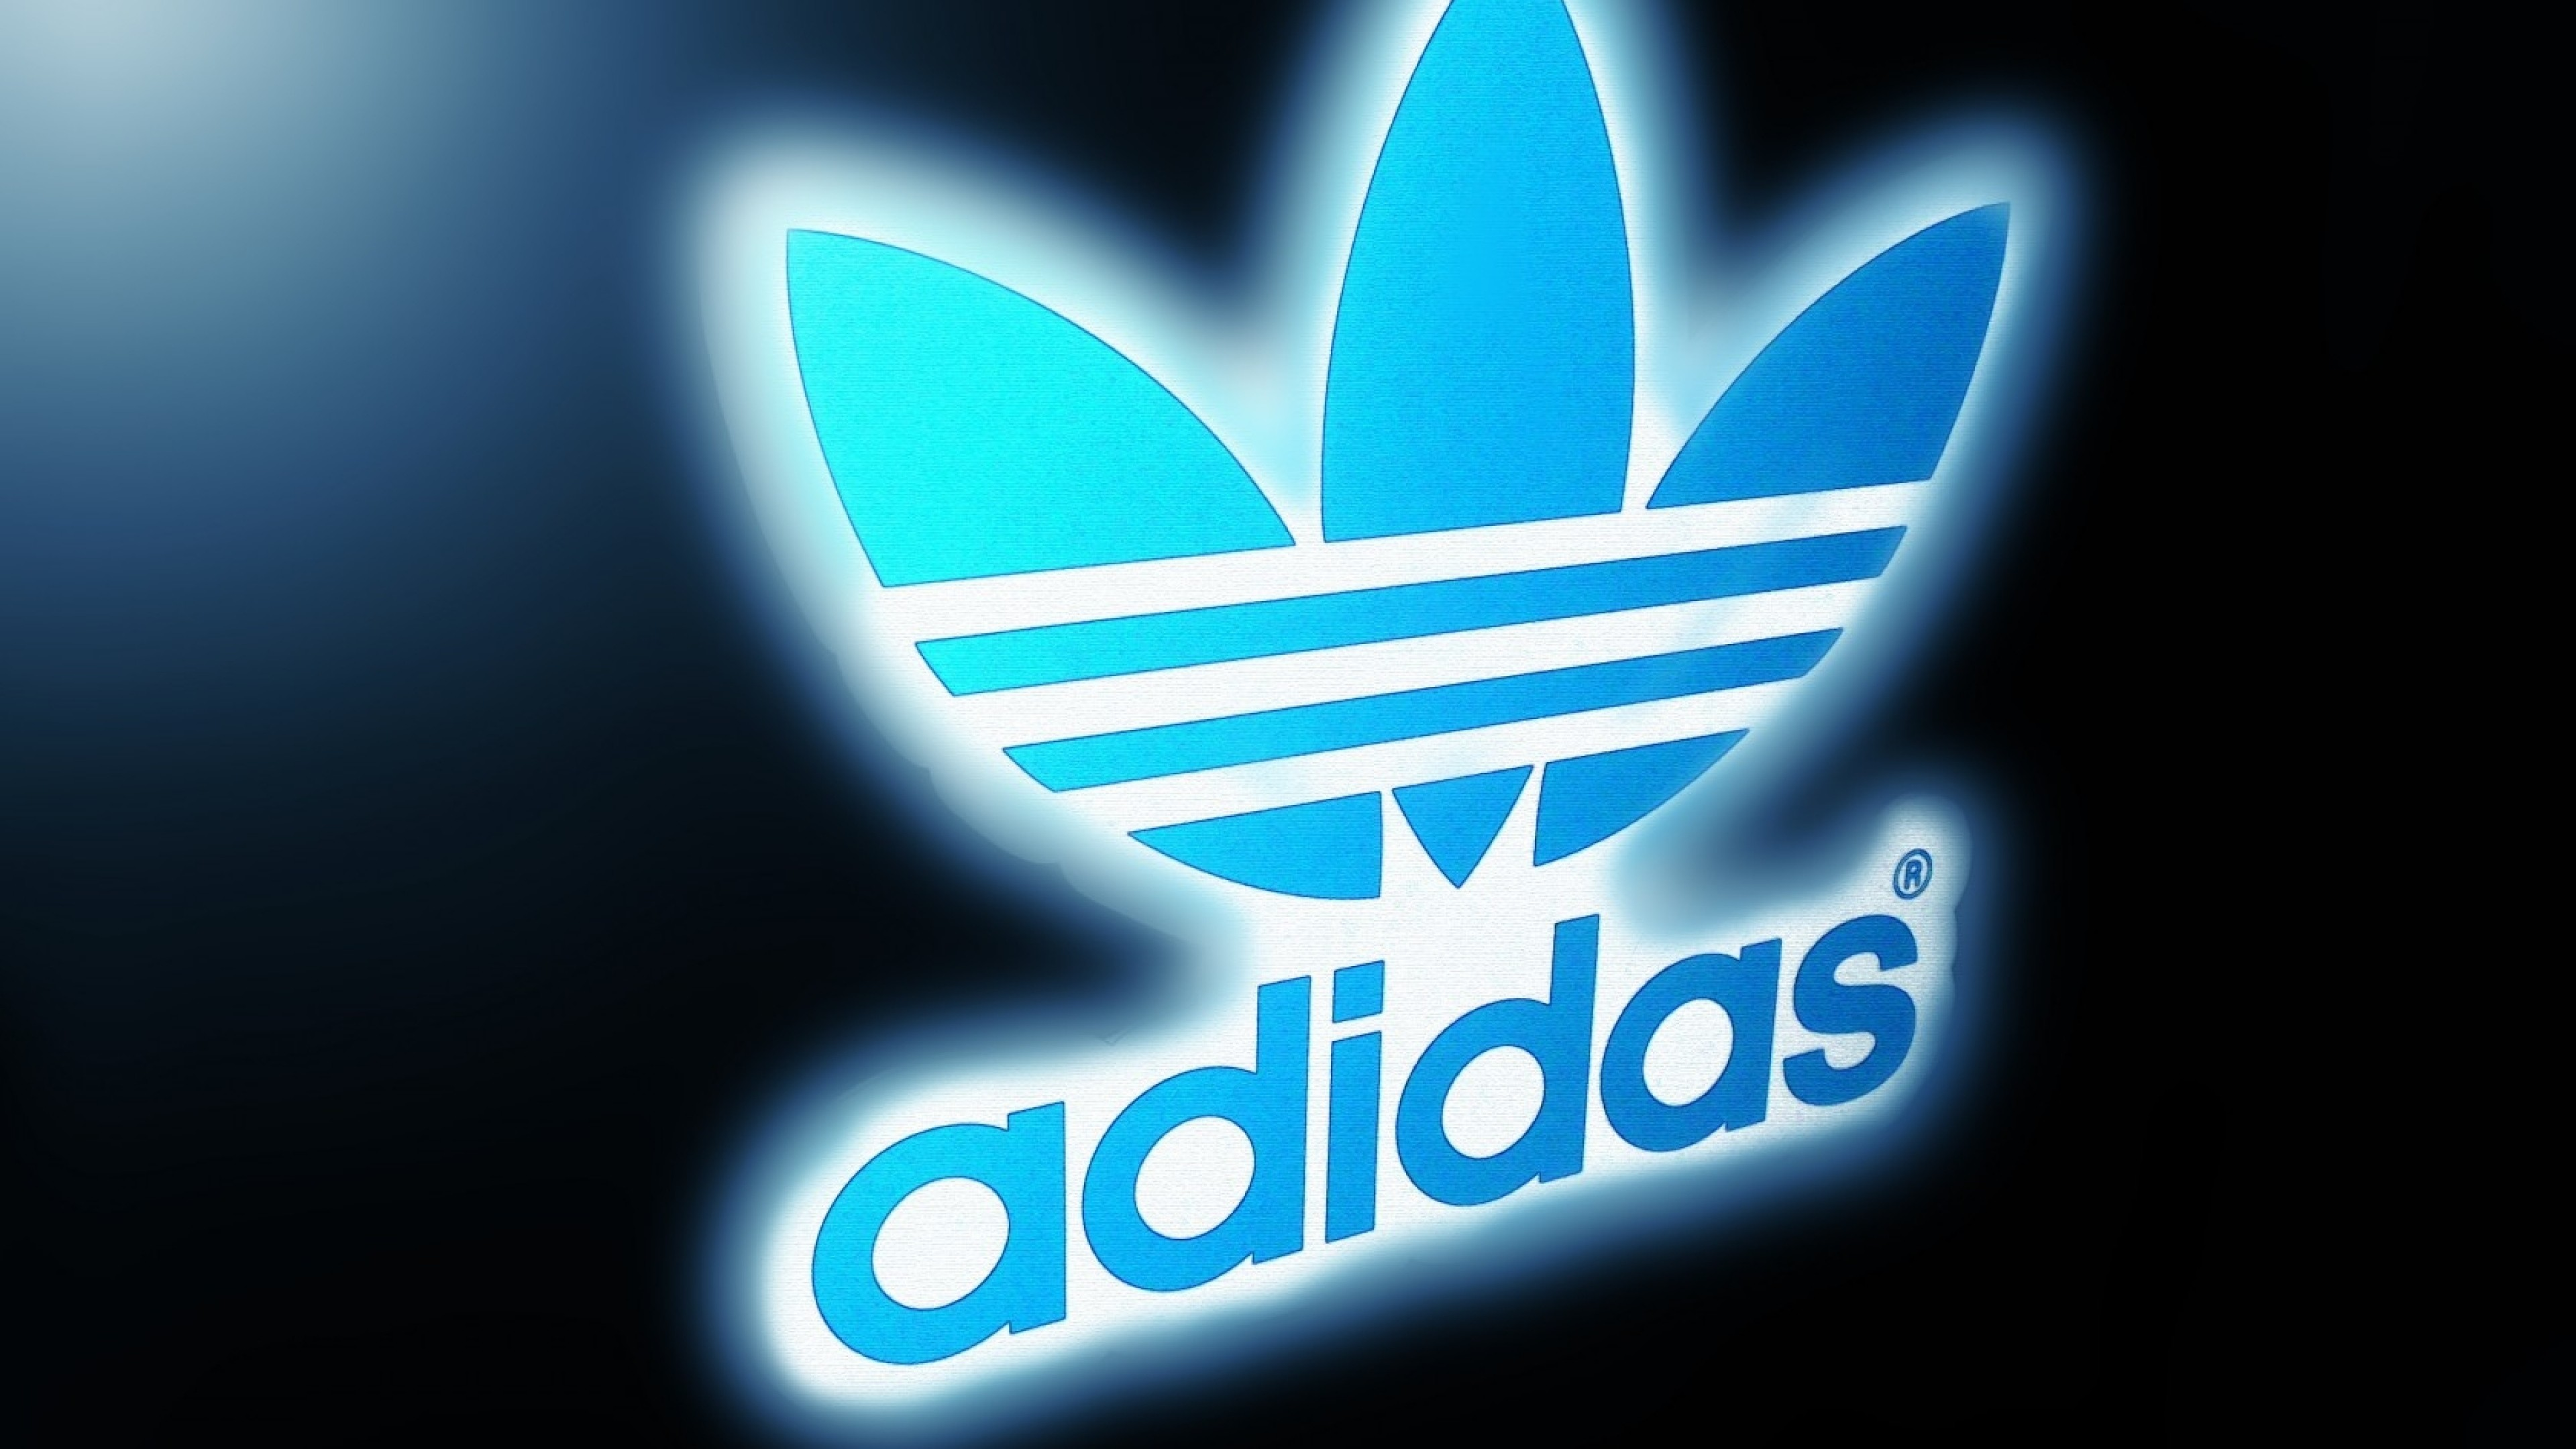 Adidas Wallpaper Adidas 76 Immagini Immagini 76 Wallpaper Adidas Immagini 76 Wallpaper qxUwBFXYw